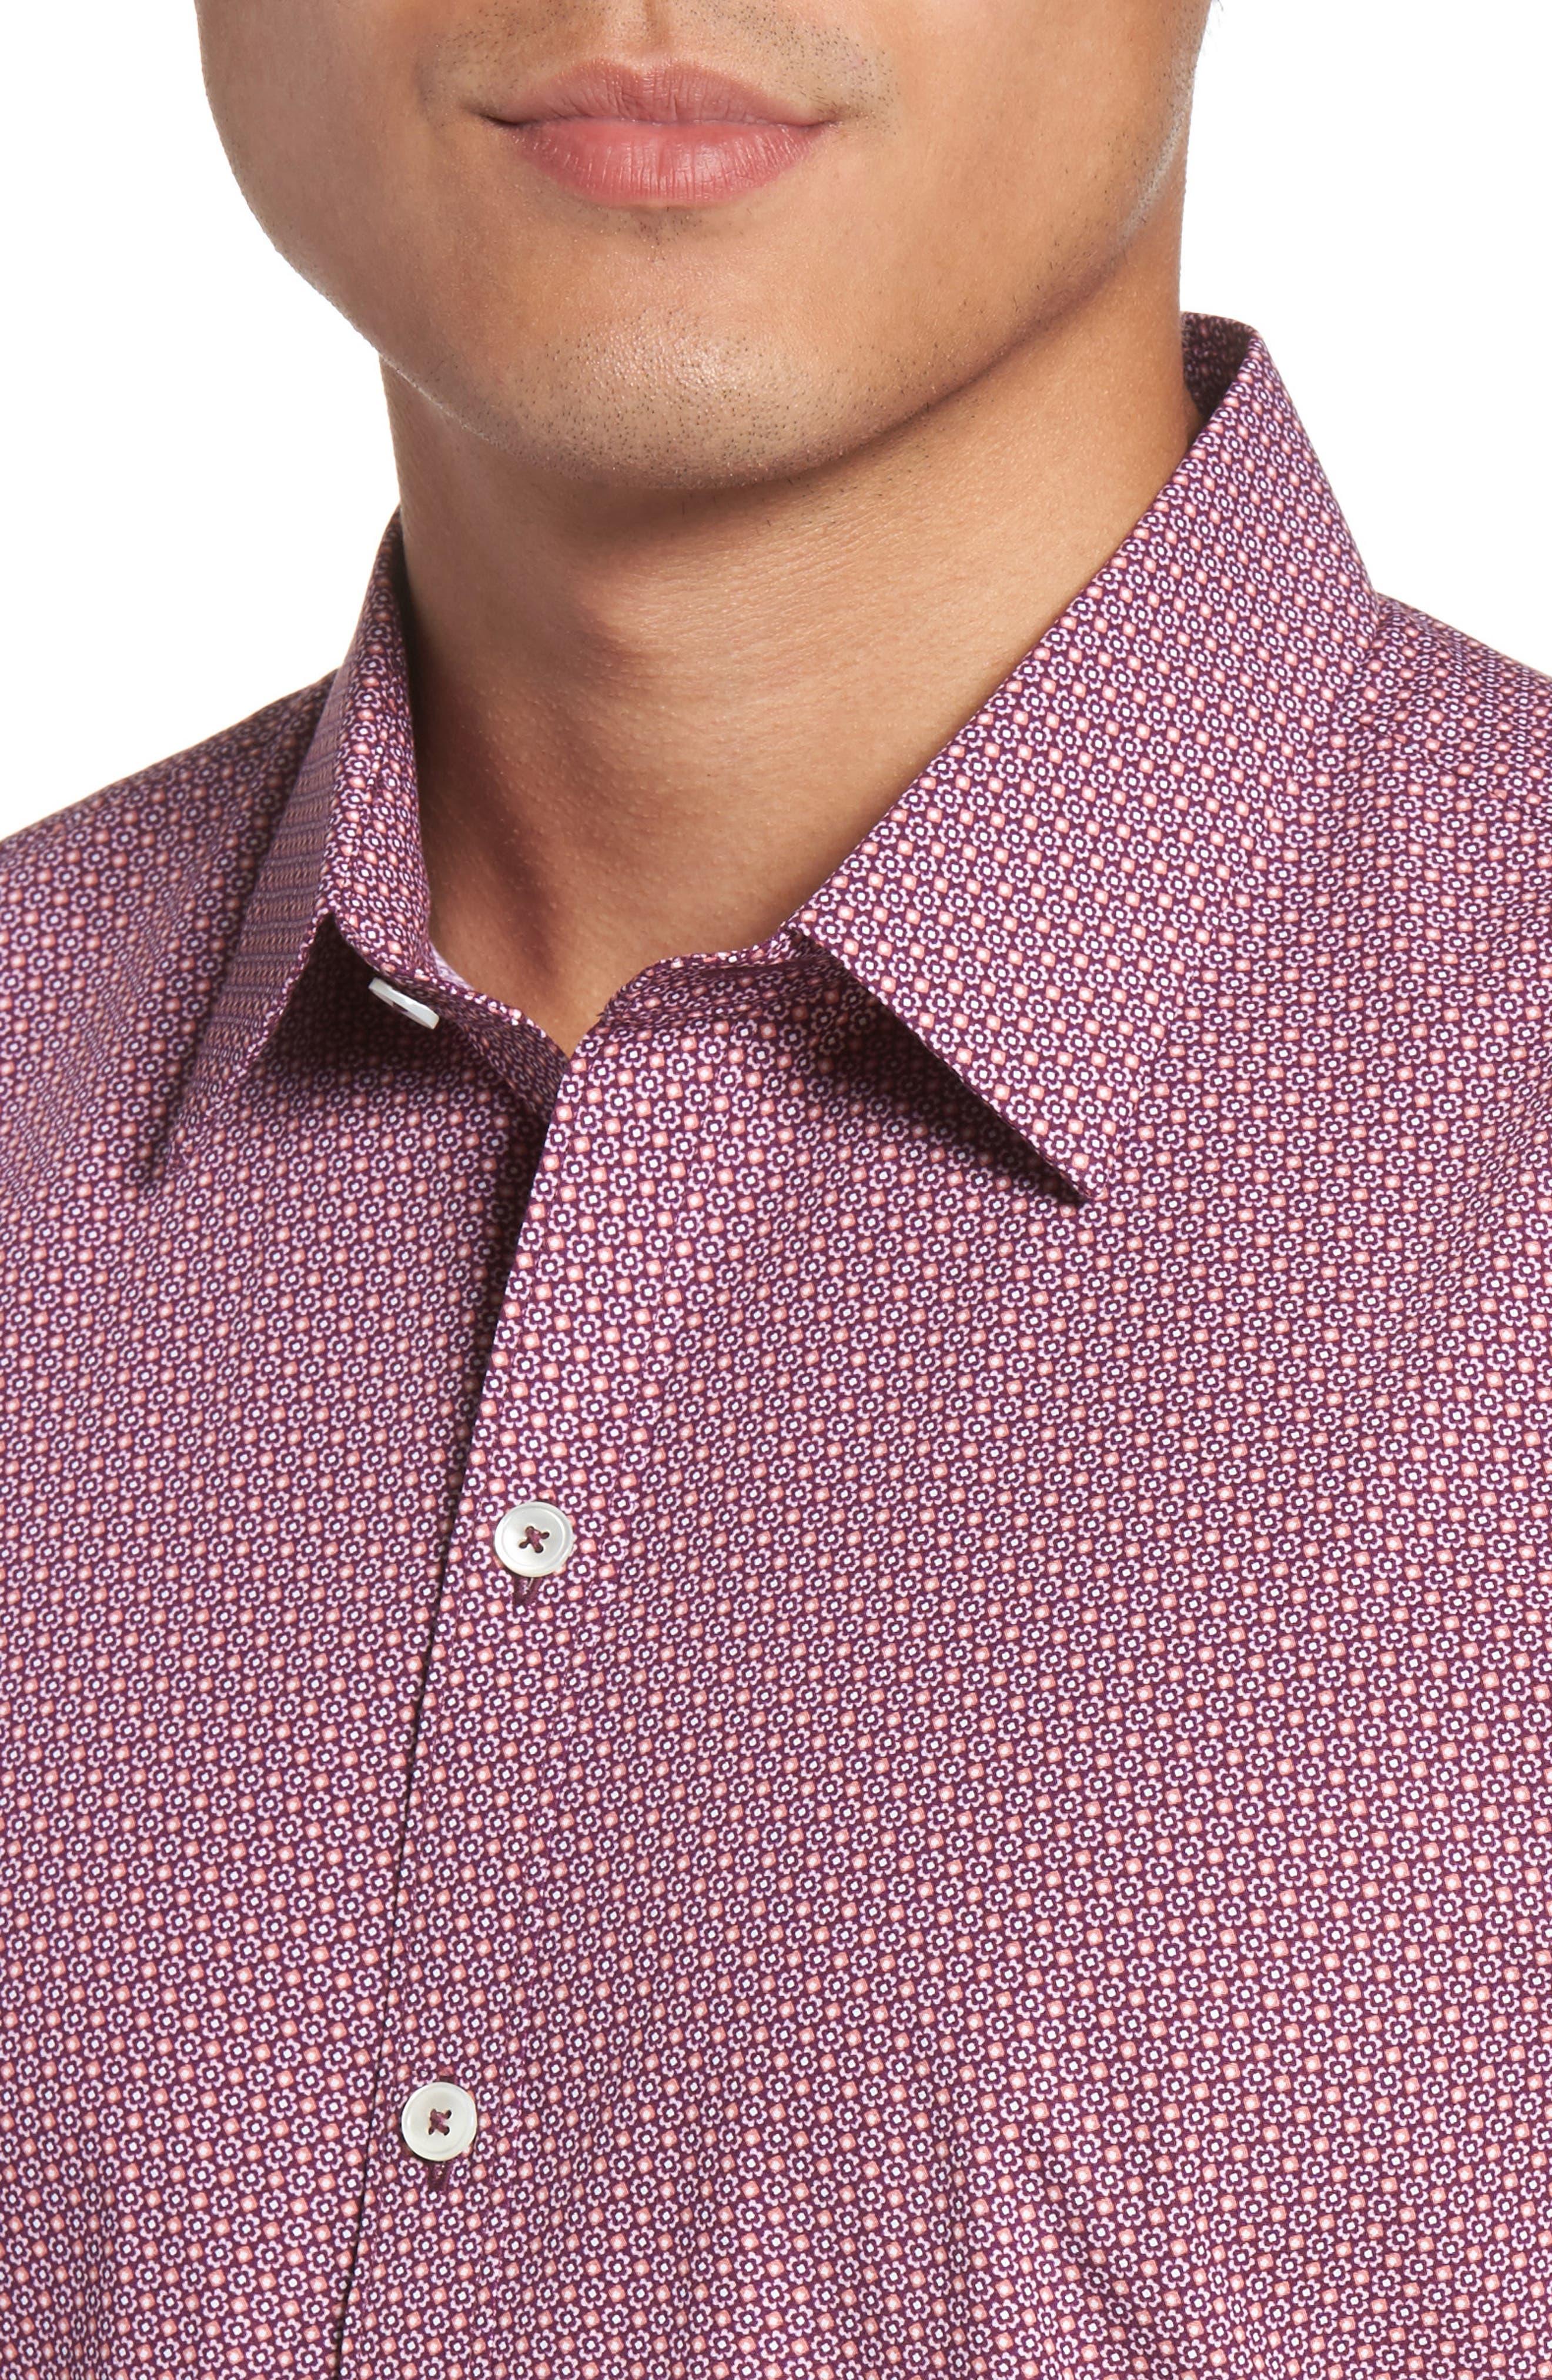 Riddle Slim Fit Print Sport Shirt,                             Alternate thumbnail 4, color,